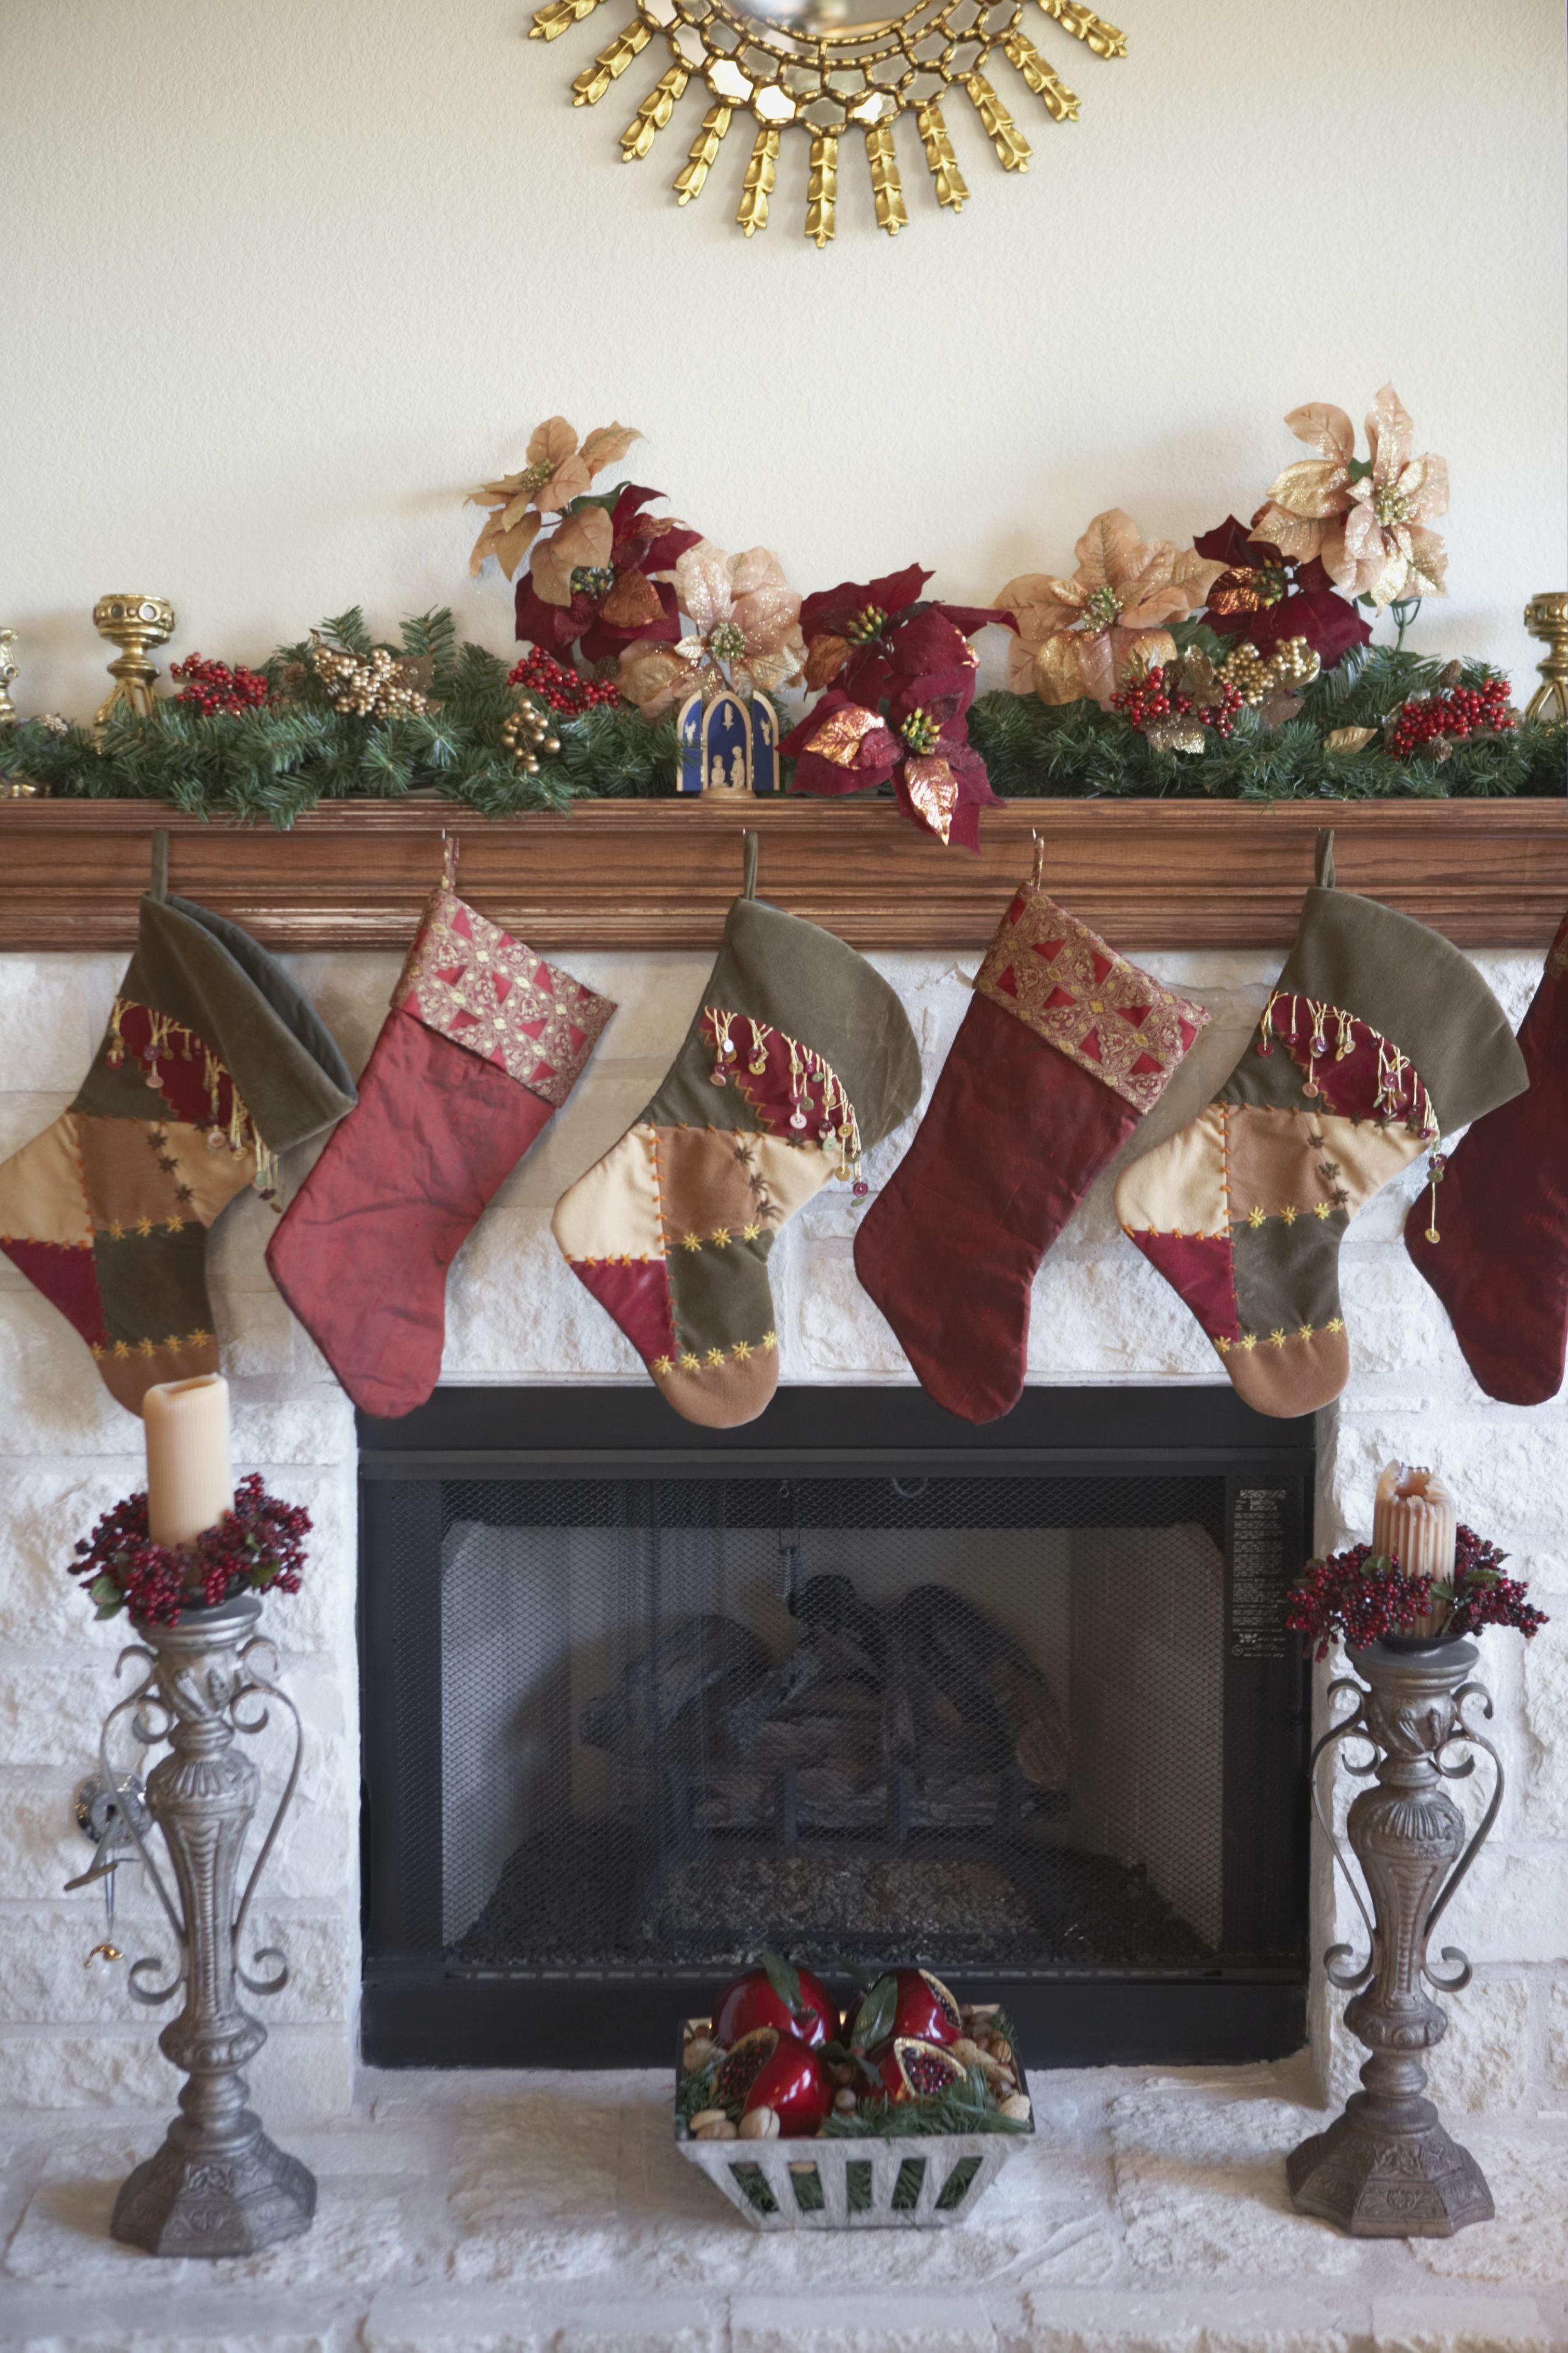 Chimenea decorada para navidad | DECORACIÓN NAVIDEÑA | Pinterest ...